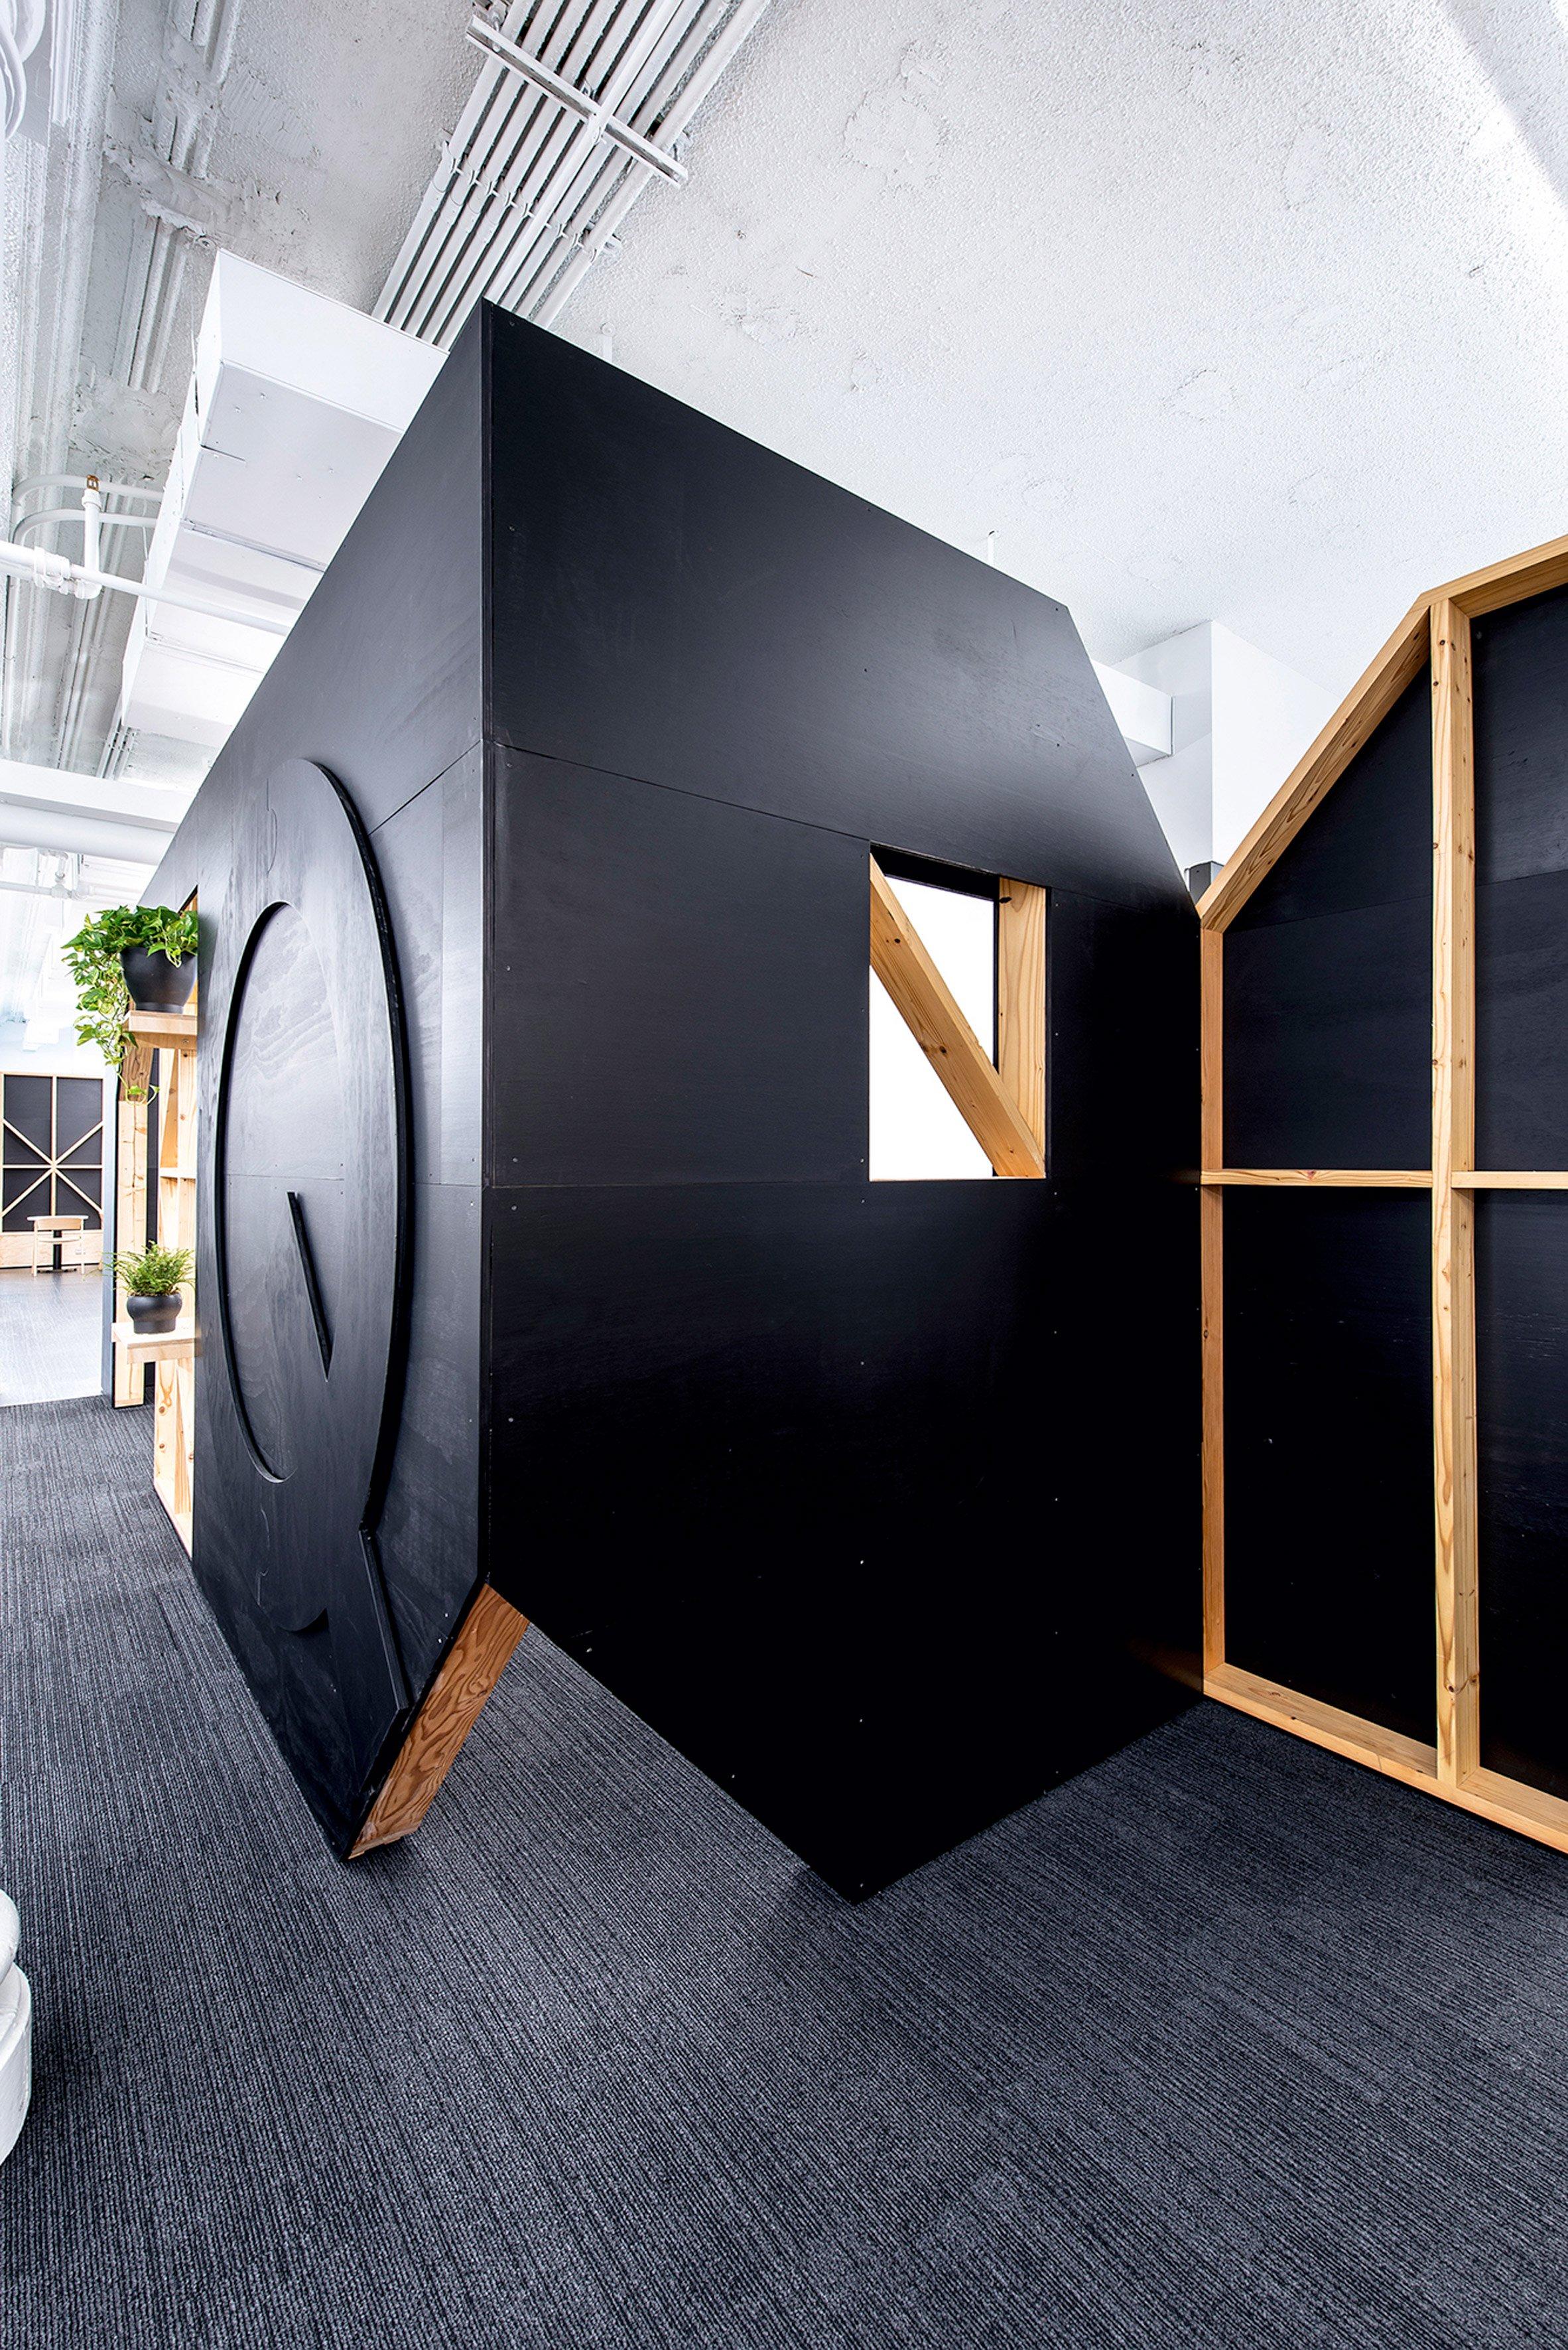 architecture-interiors-offices- manhatten-new-york-design-studia-osnovadesign-osnova-poltava_11